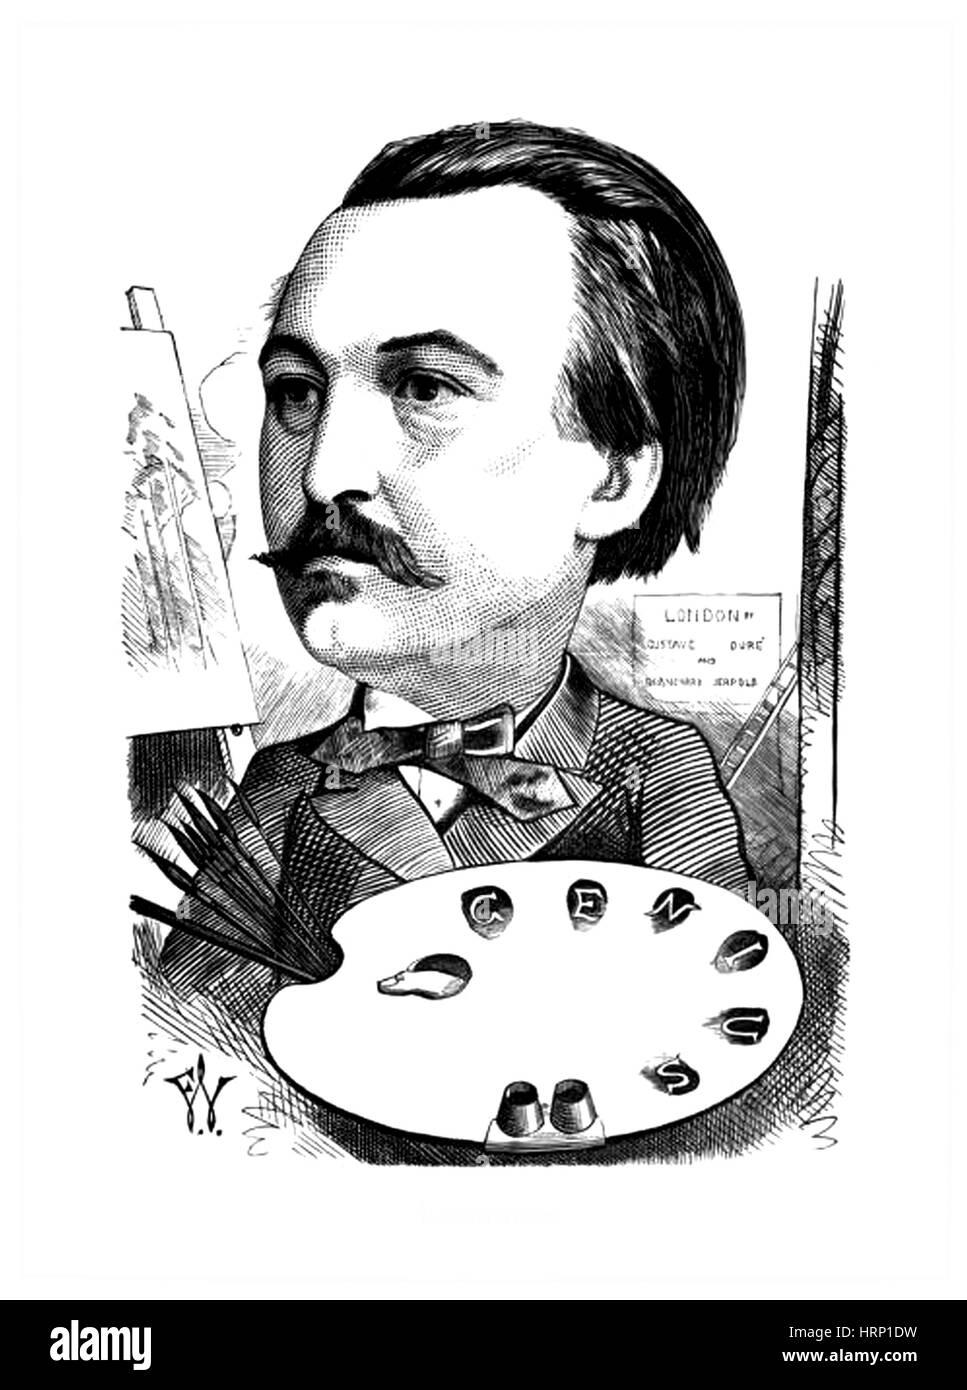 Gustave Dor̩, French Artist - Stock Image